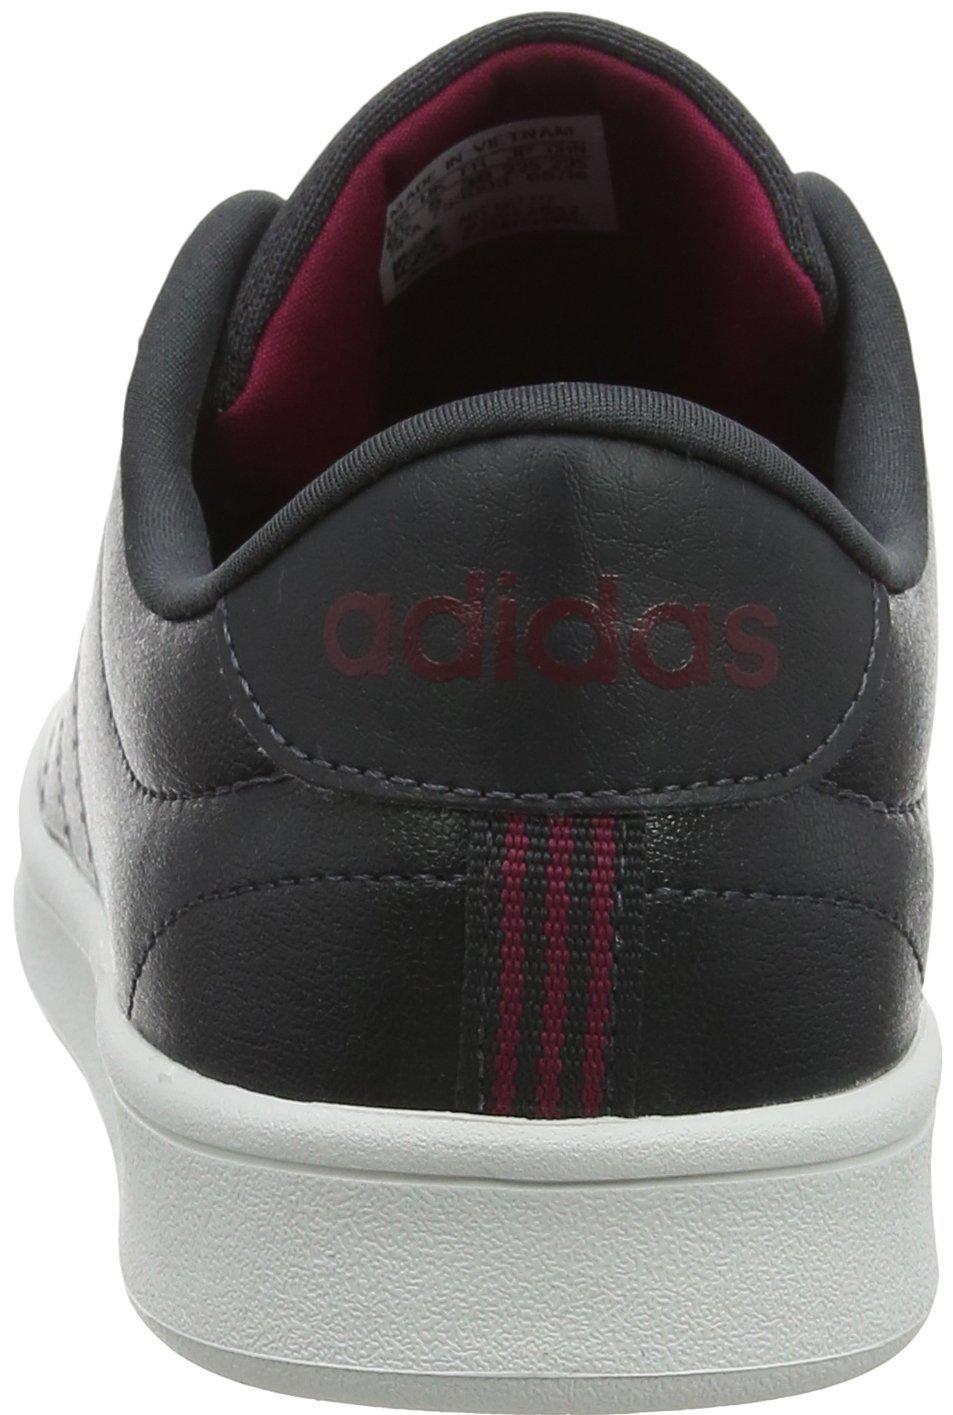 adidas Advantage Cl QT, Scarpe da Tennis Donna 2 spesavip